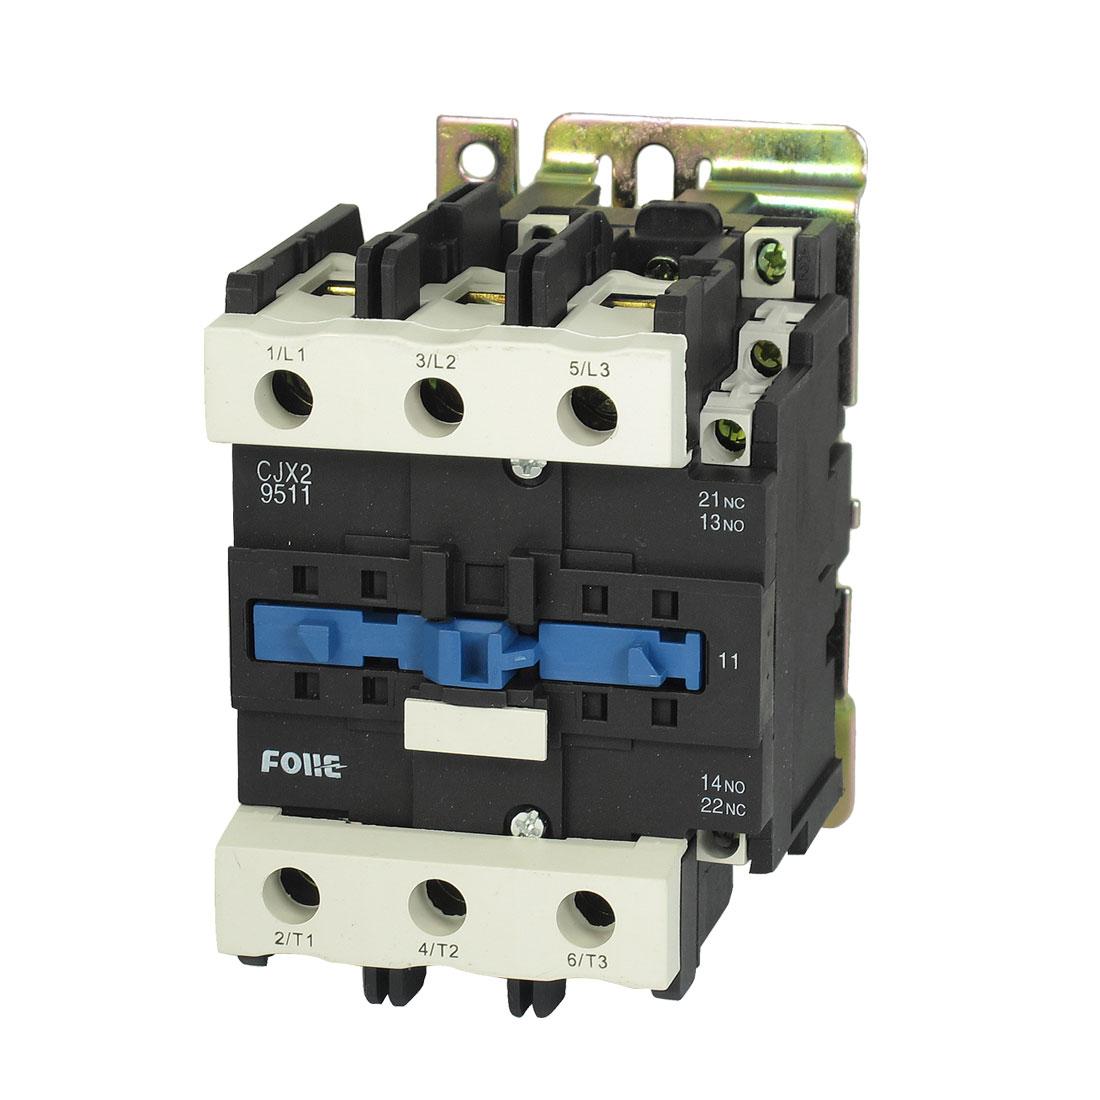 CJX2-9511 AC Contactor 220V 50/60Hz Coil 95A 3-Phase 3-Pole NO + NC